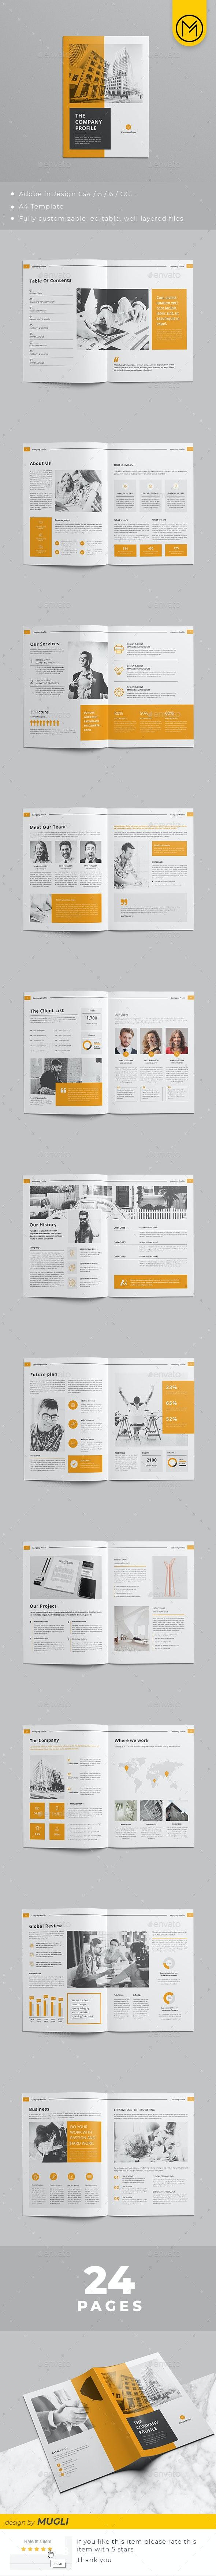 Brochures Design v2 - Corporate Brochures